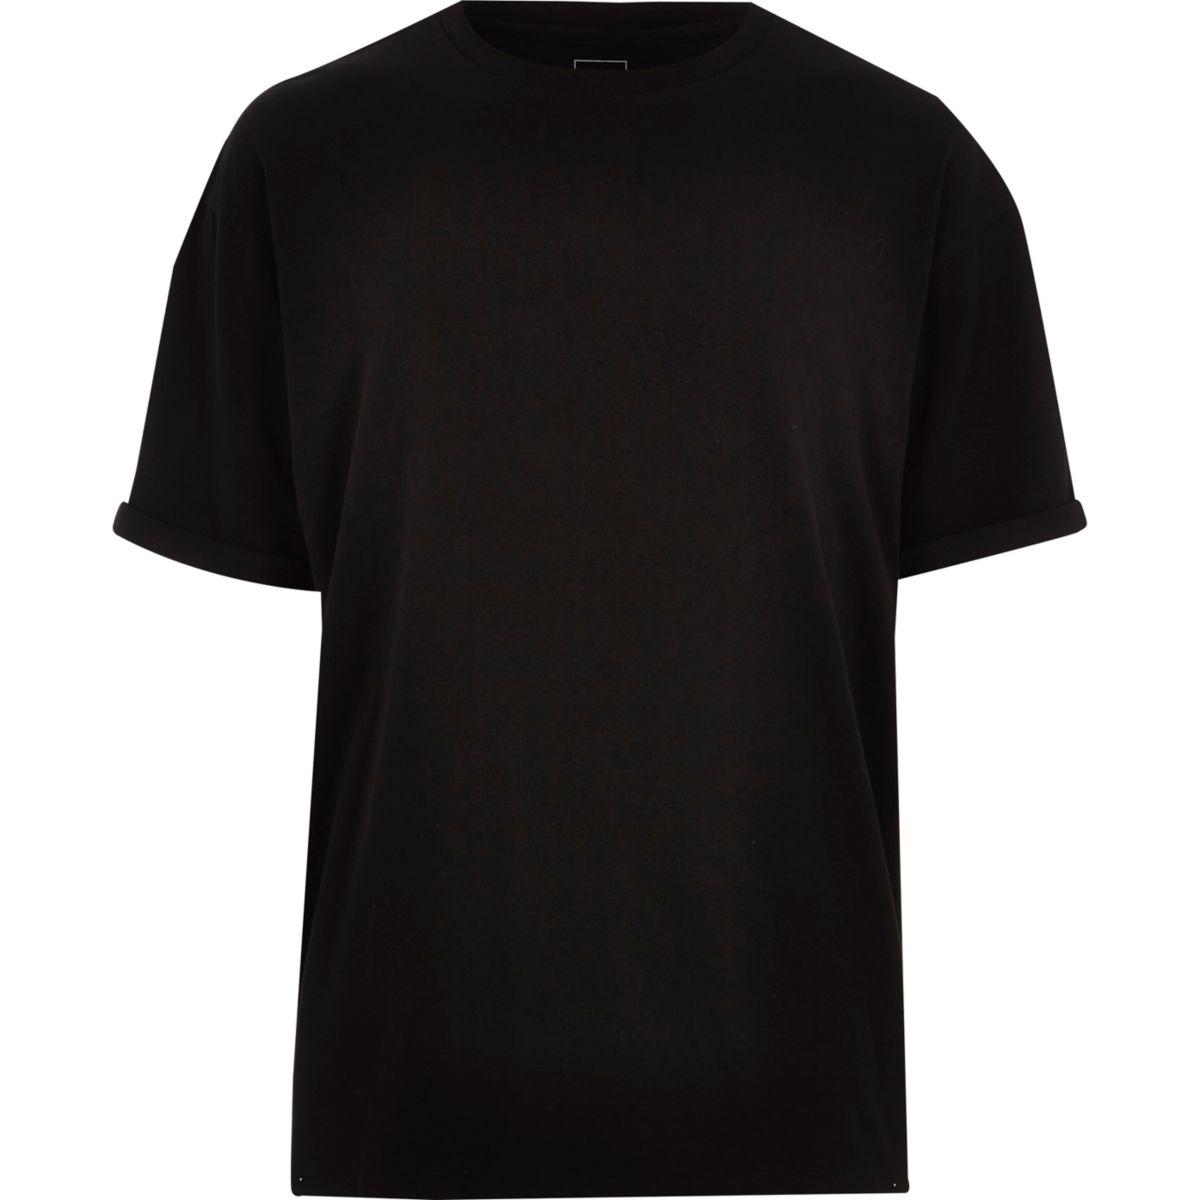 Black oversized fit crew neck T-shirt